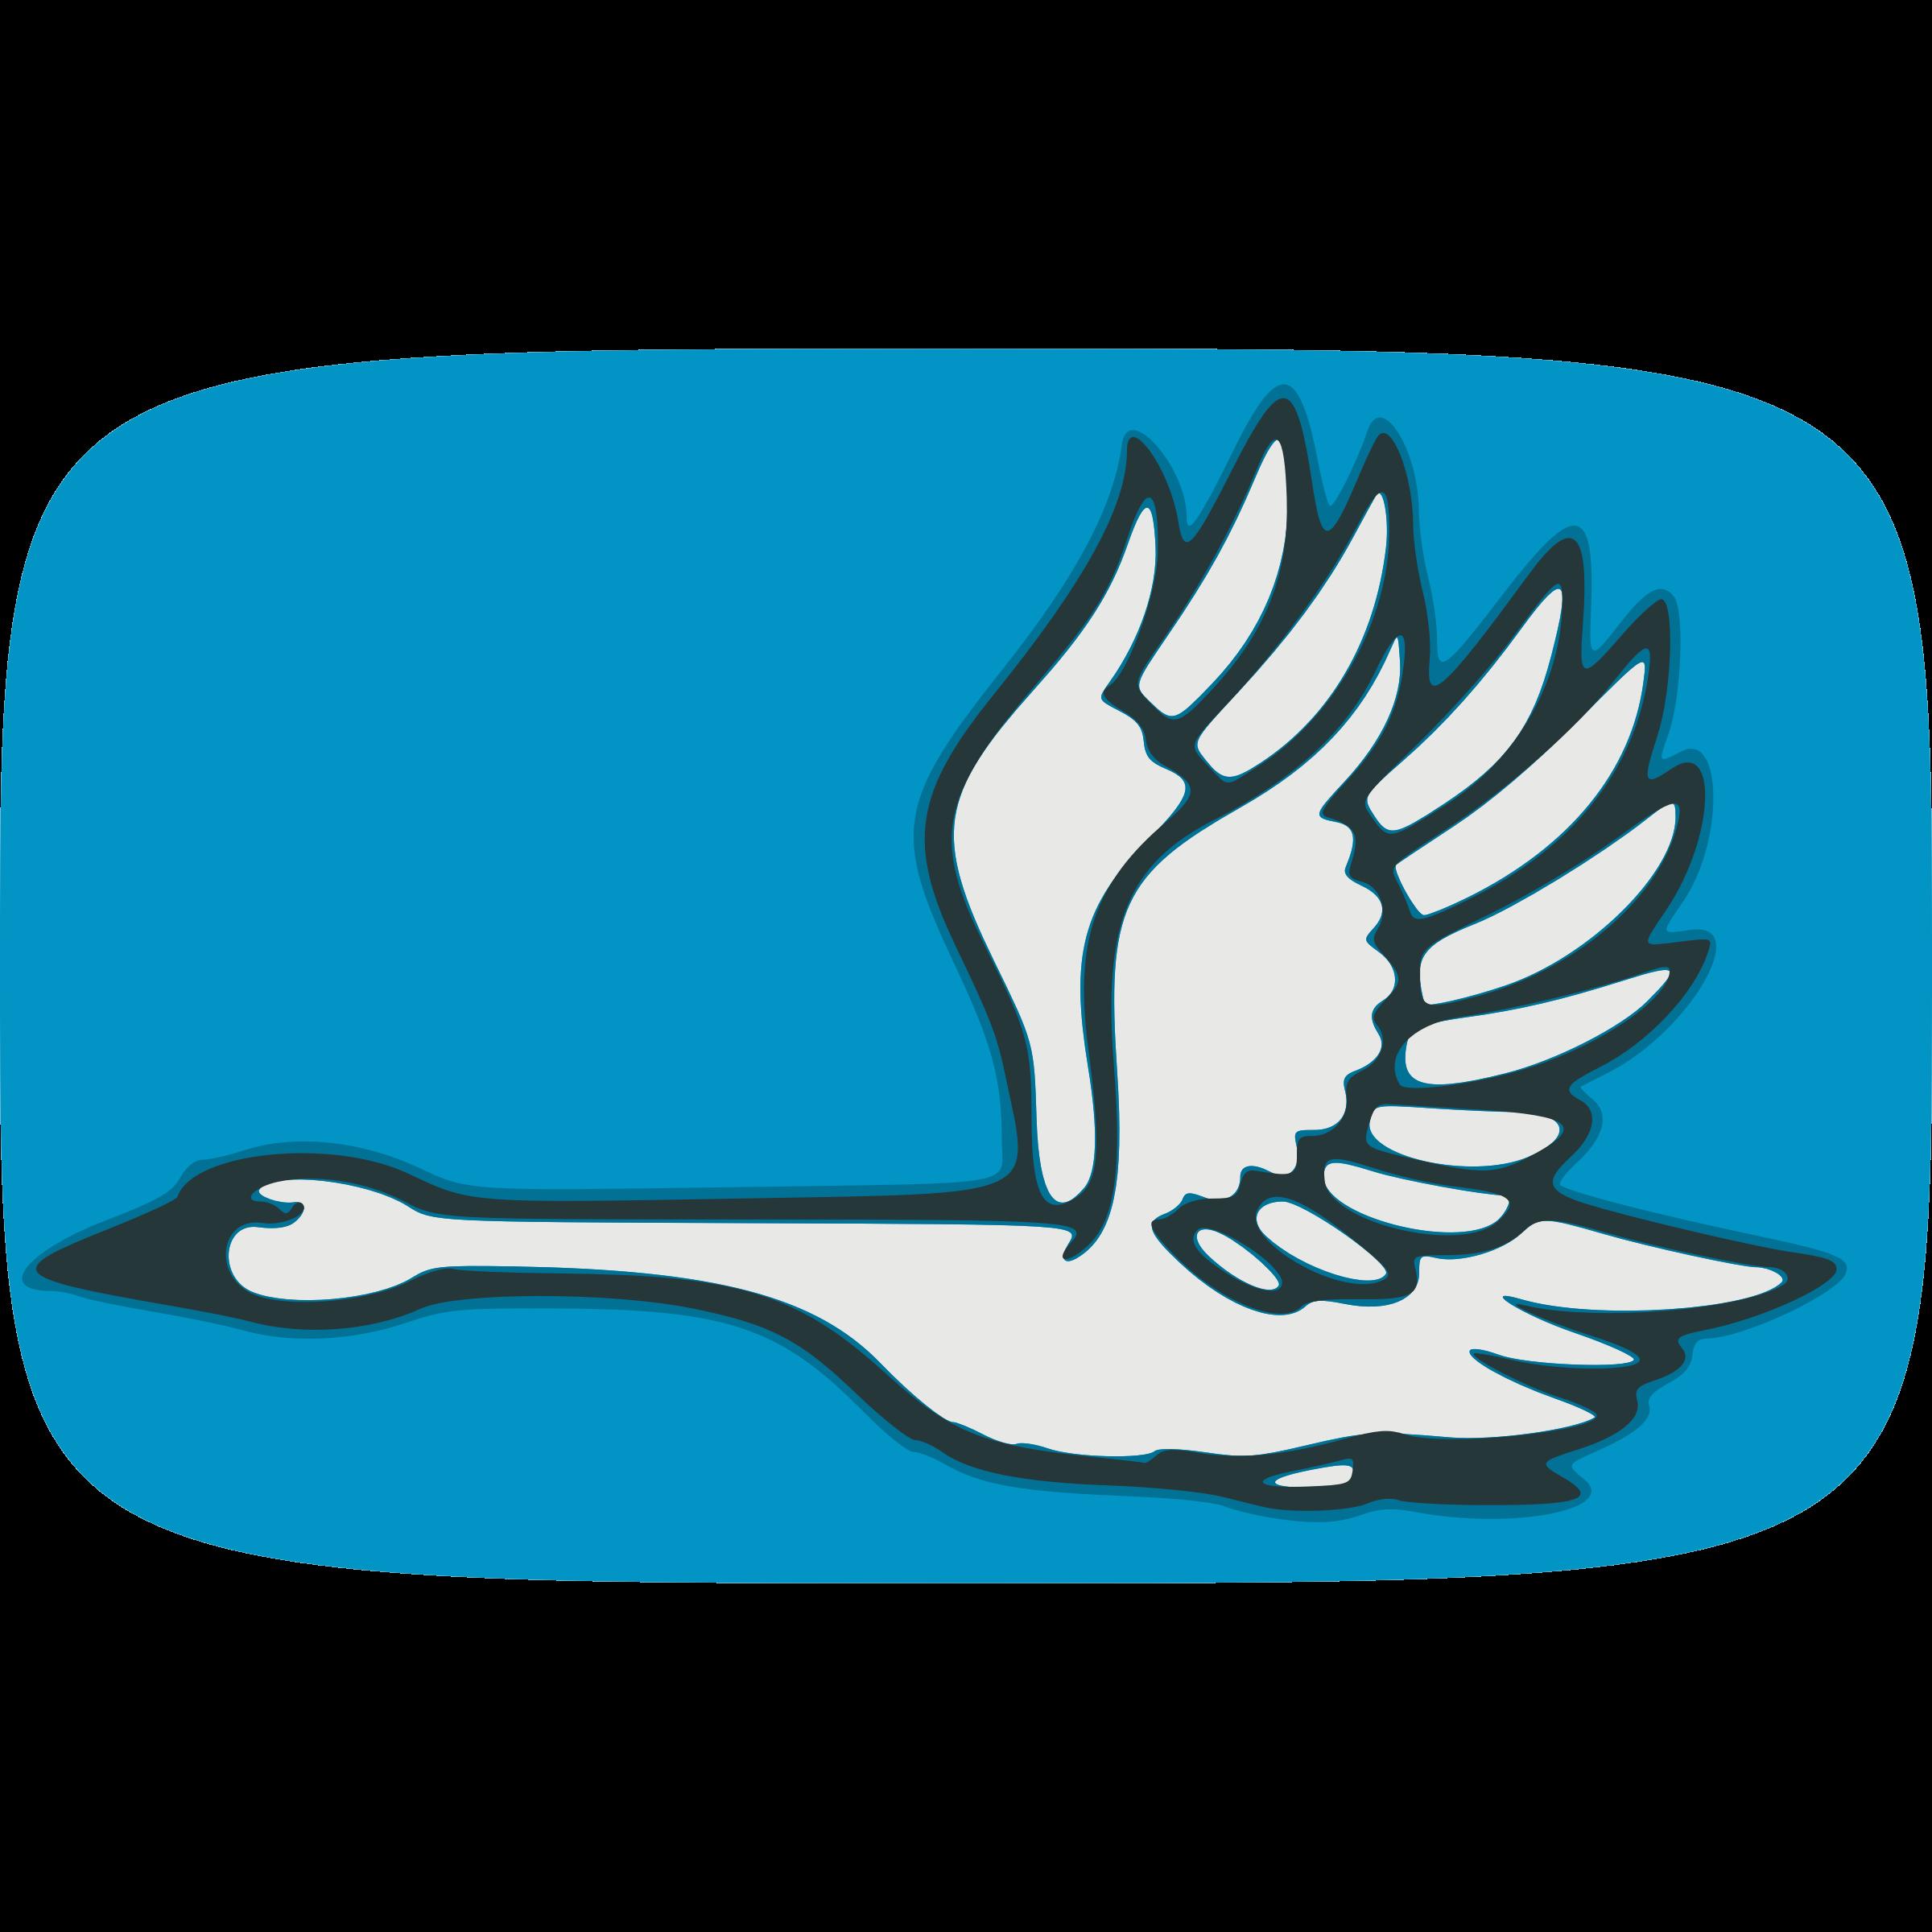 Trumpeter Swan clipart #3, Download drawings